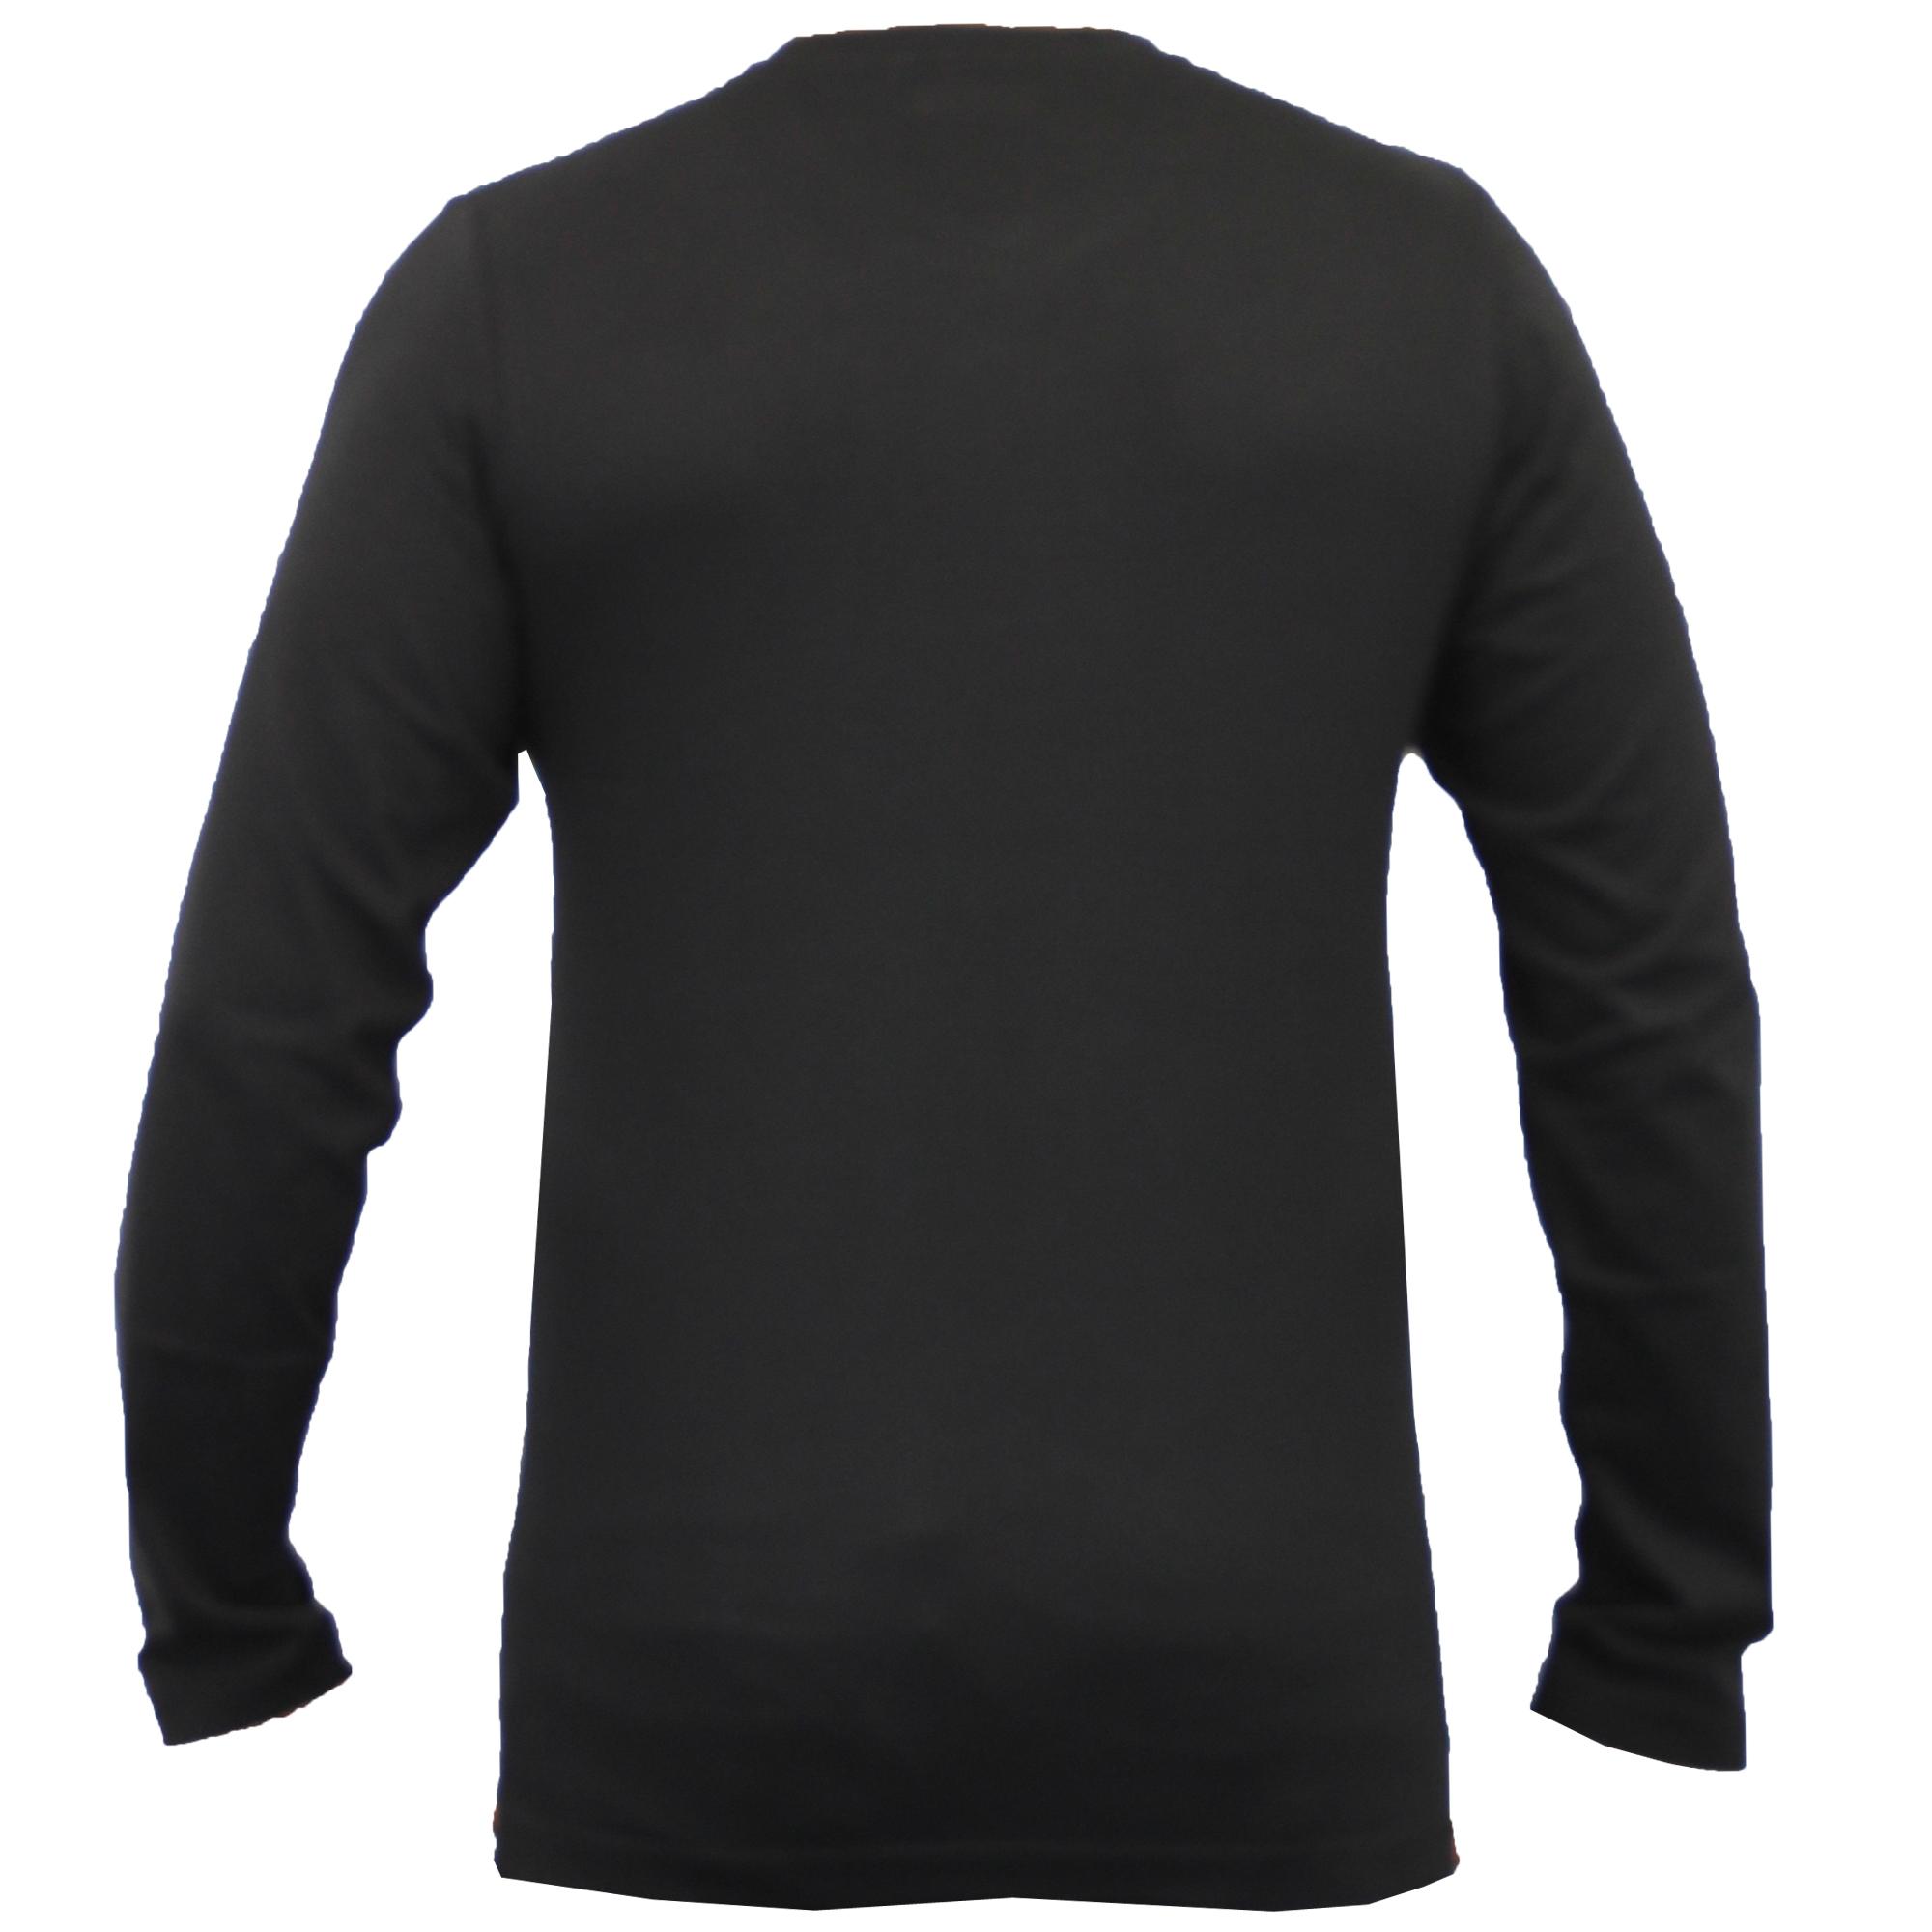 Mens long sleeved striped jersey top t shirt by brave soul for Mens striped long sleeve t shirt